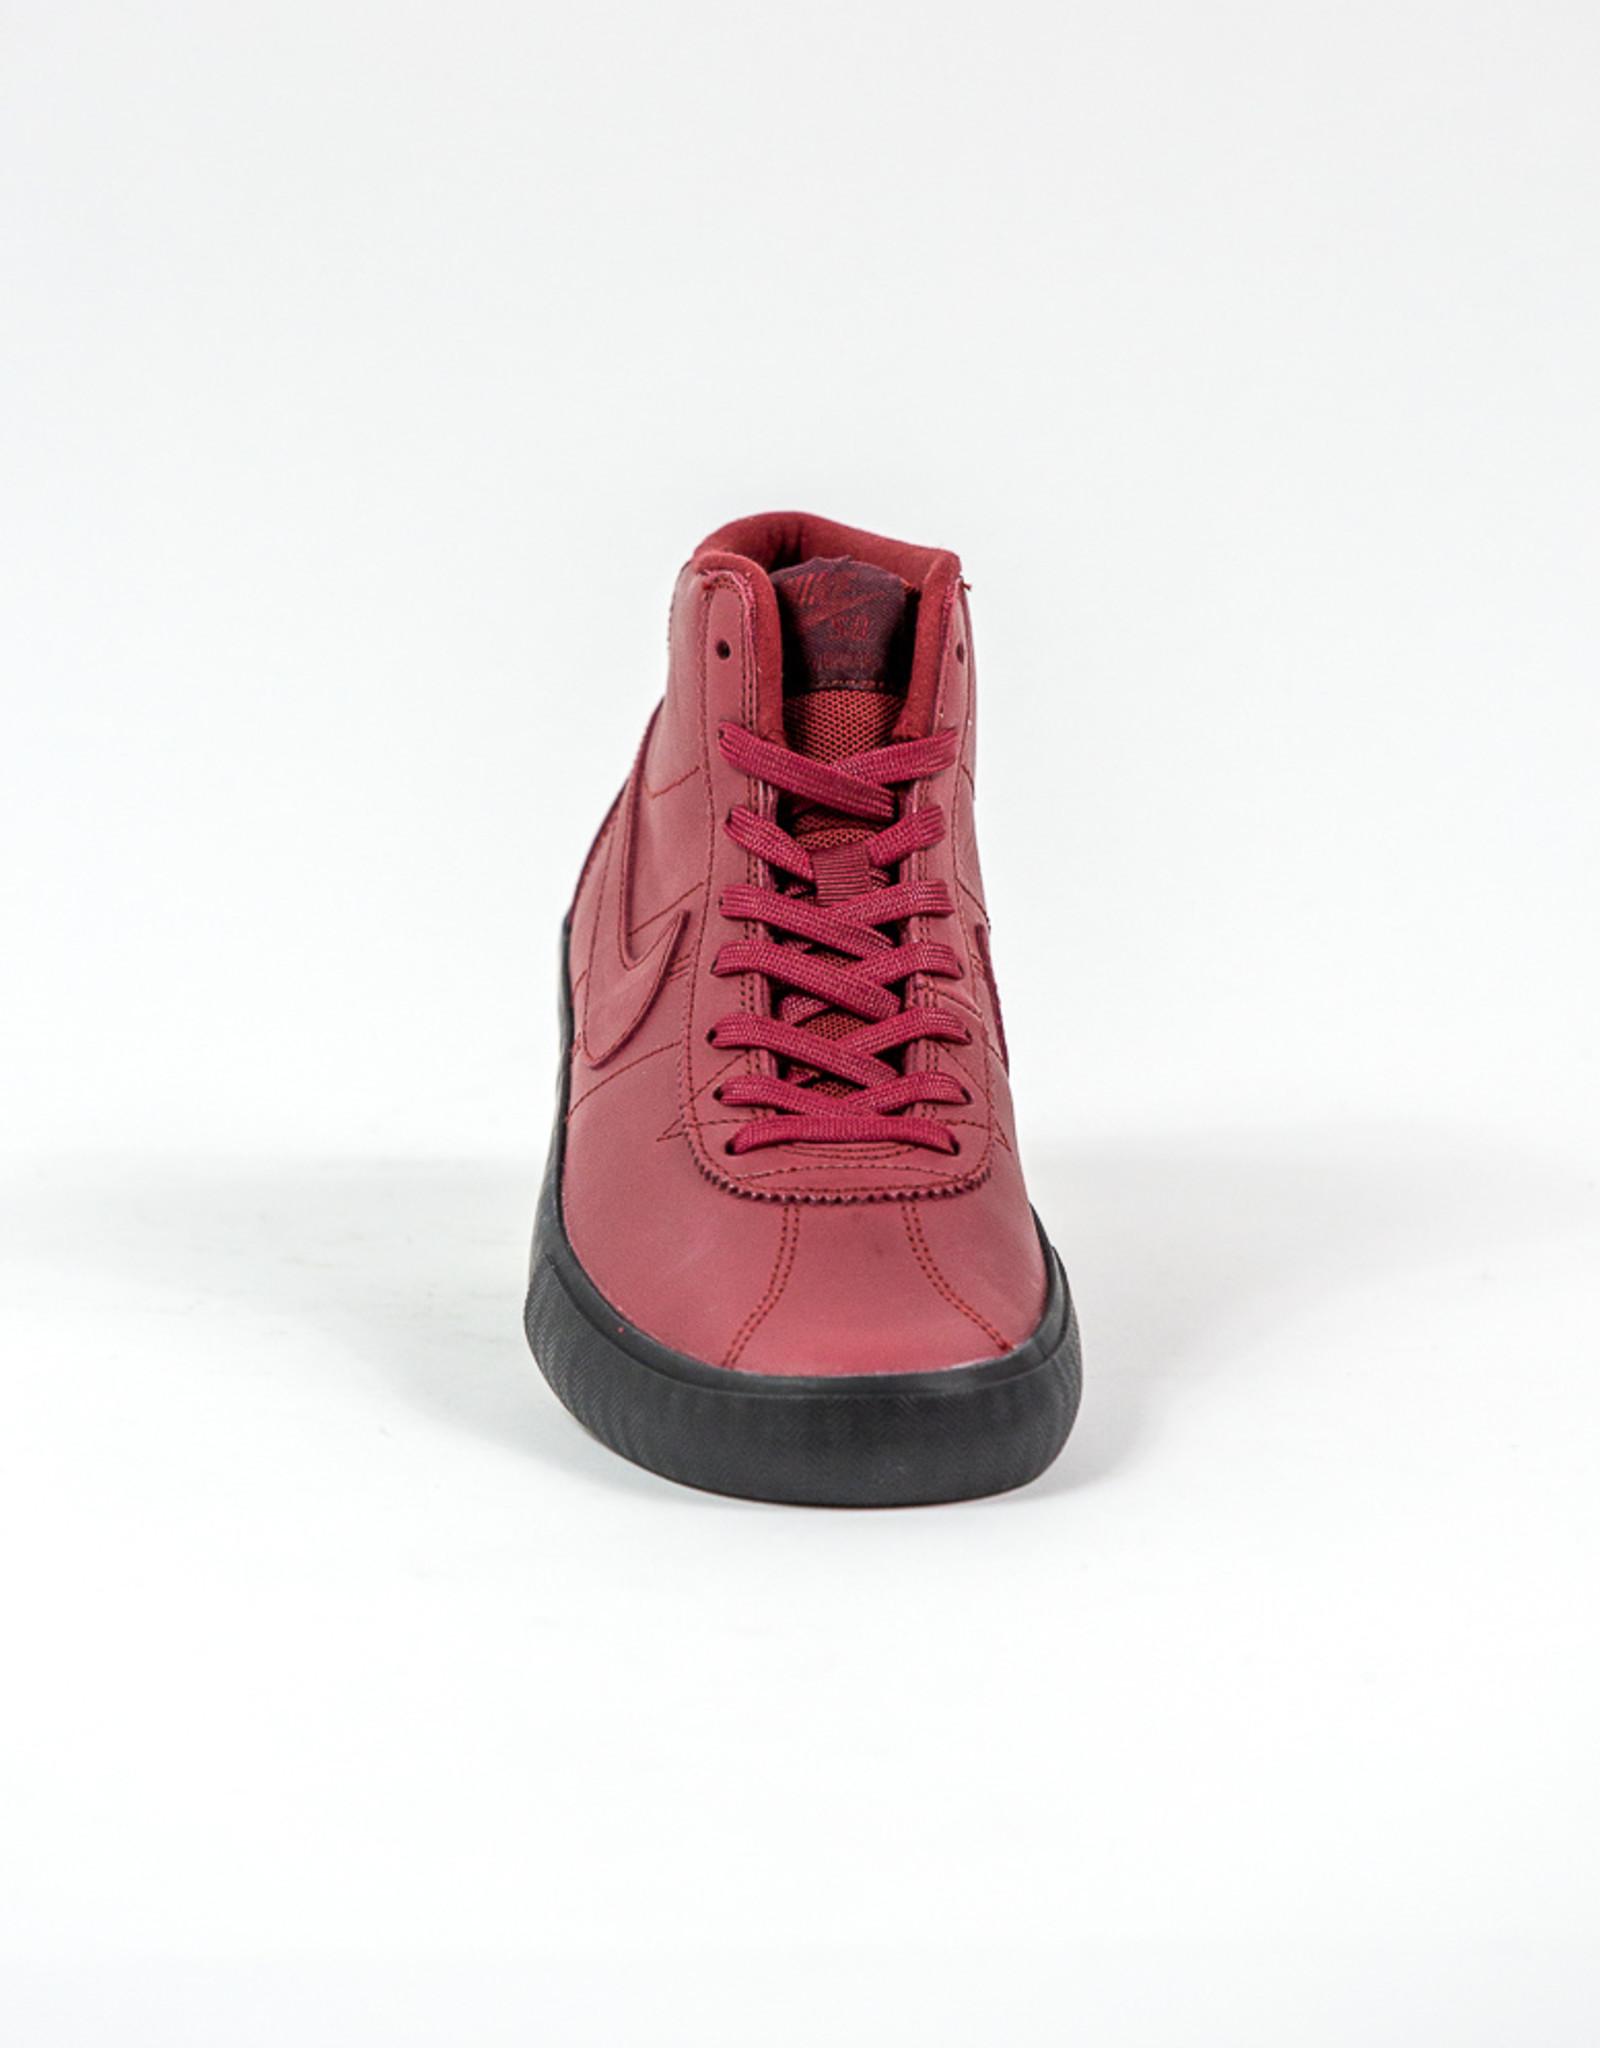 NIKE NIKE SB BRUIN HI ISO - (ORANGE LABEL) TEAM RED/NIGHT MAROON